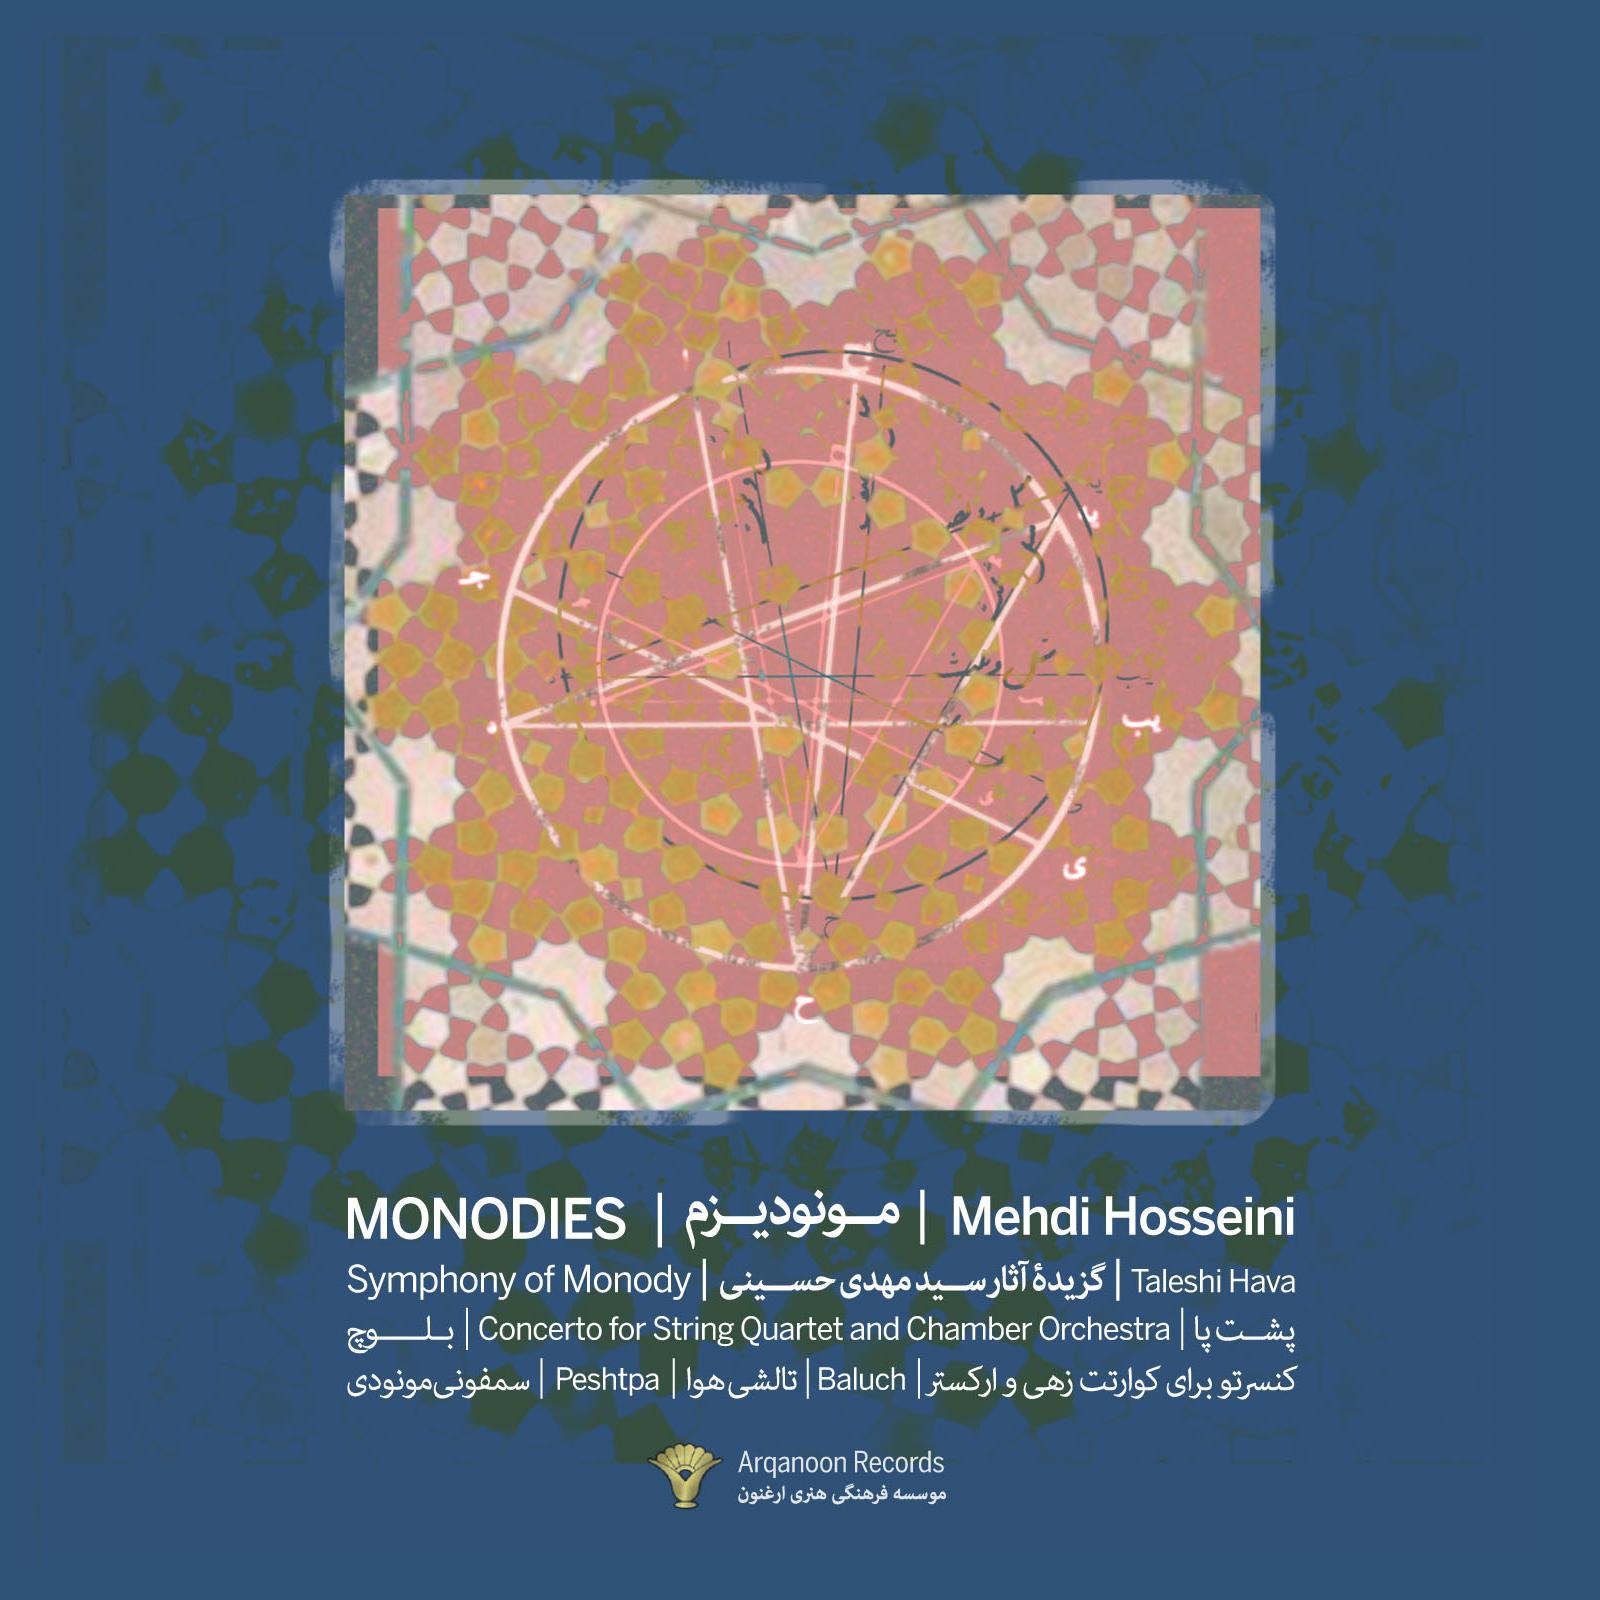 https://www.monodies.com/wp-content/uploads/2019/02/Monodies_Mehdi-Hosseini__1600x1600.jpg